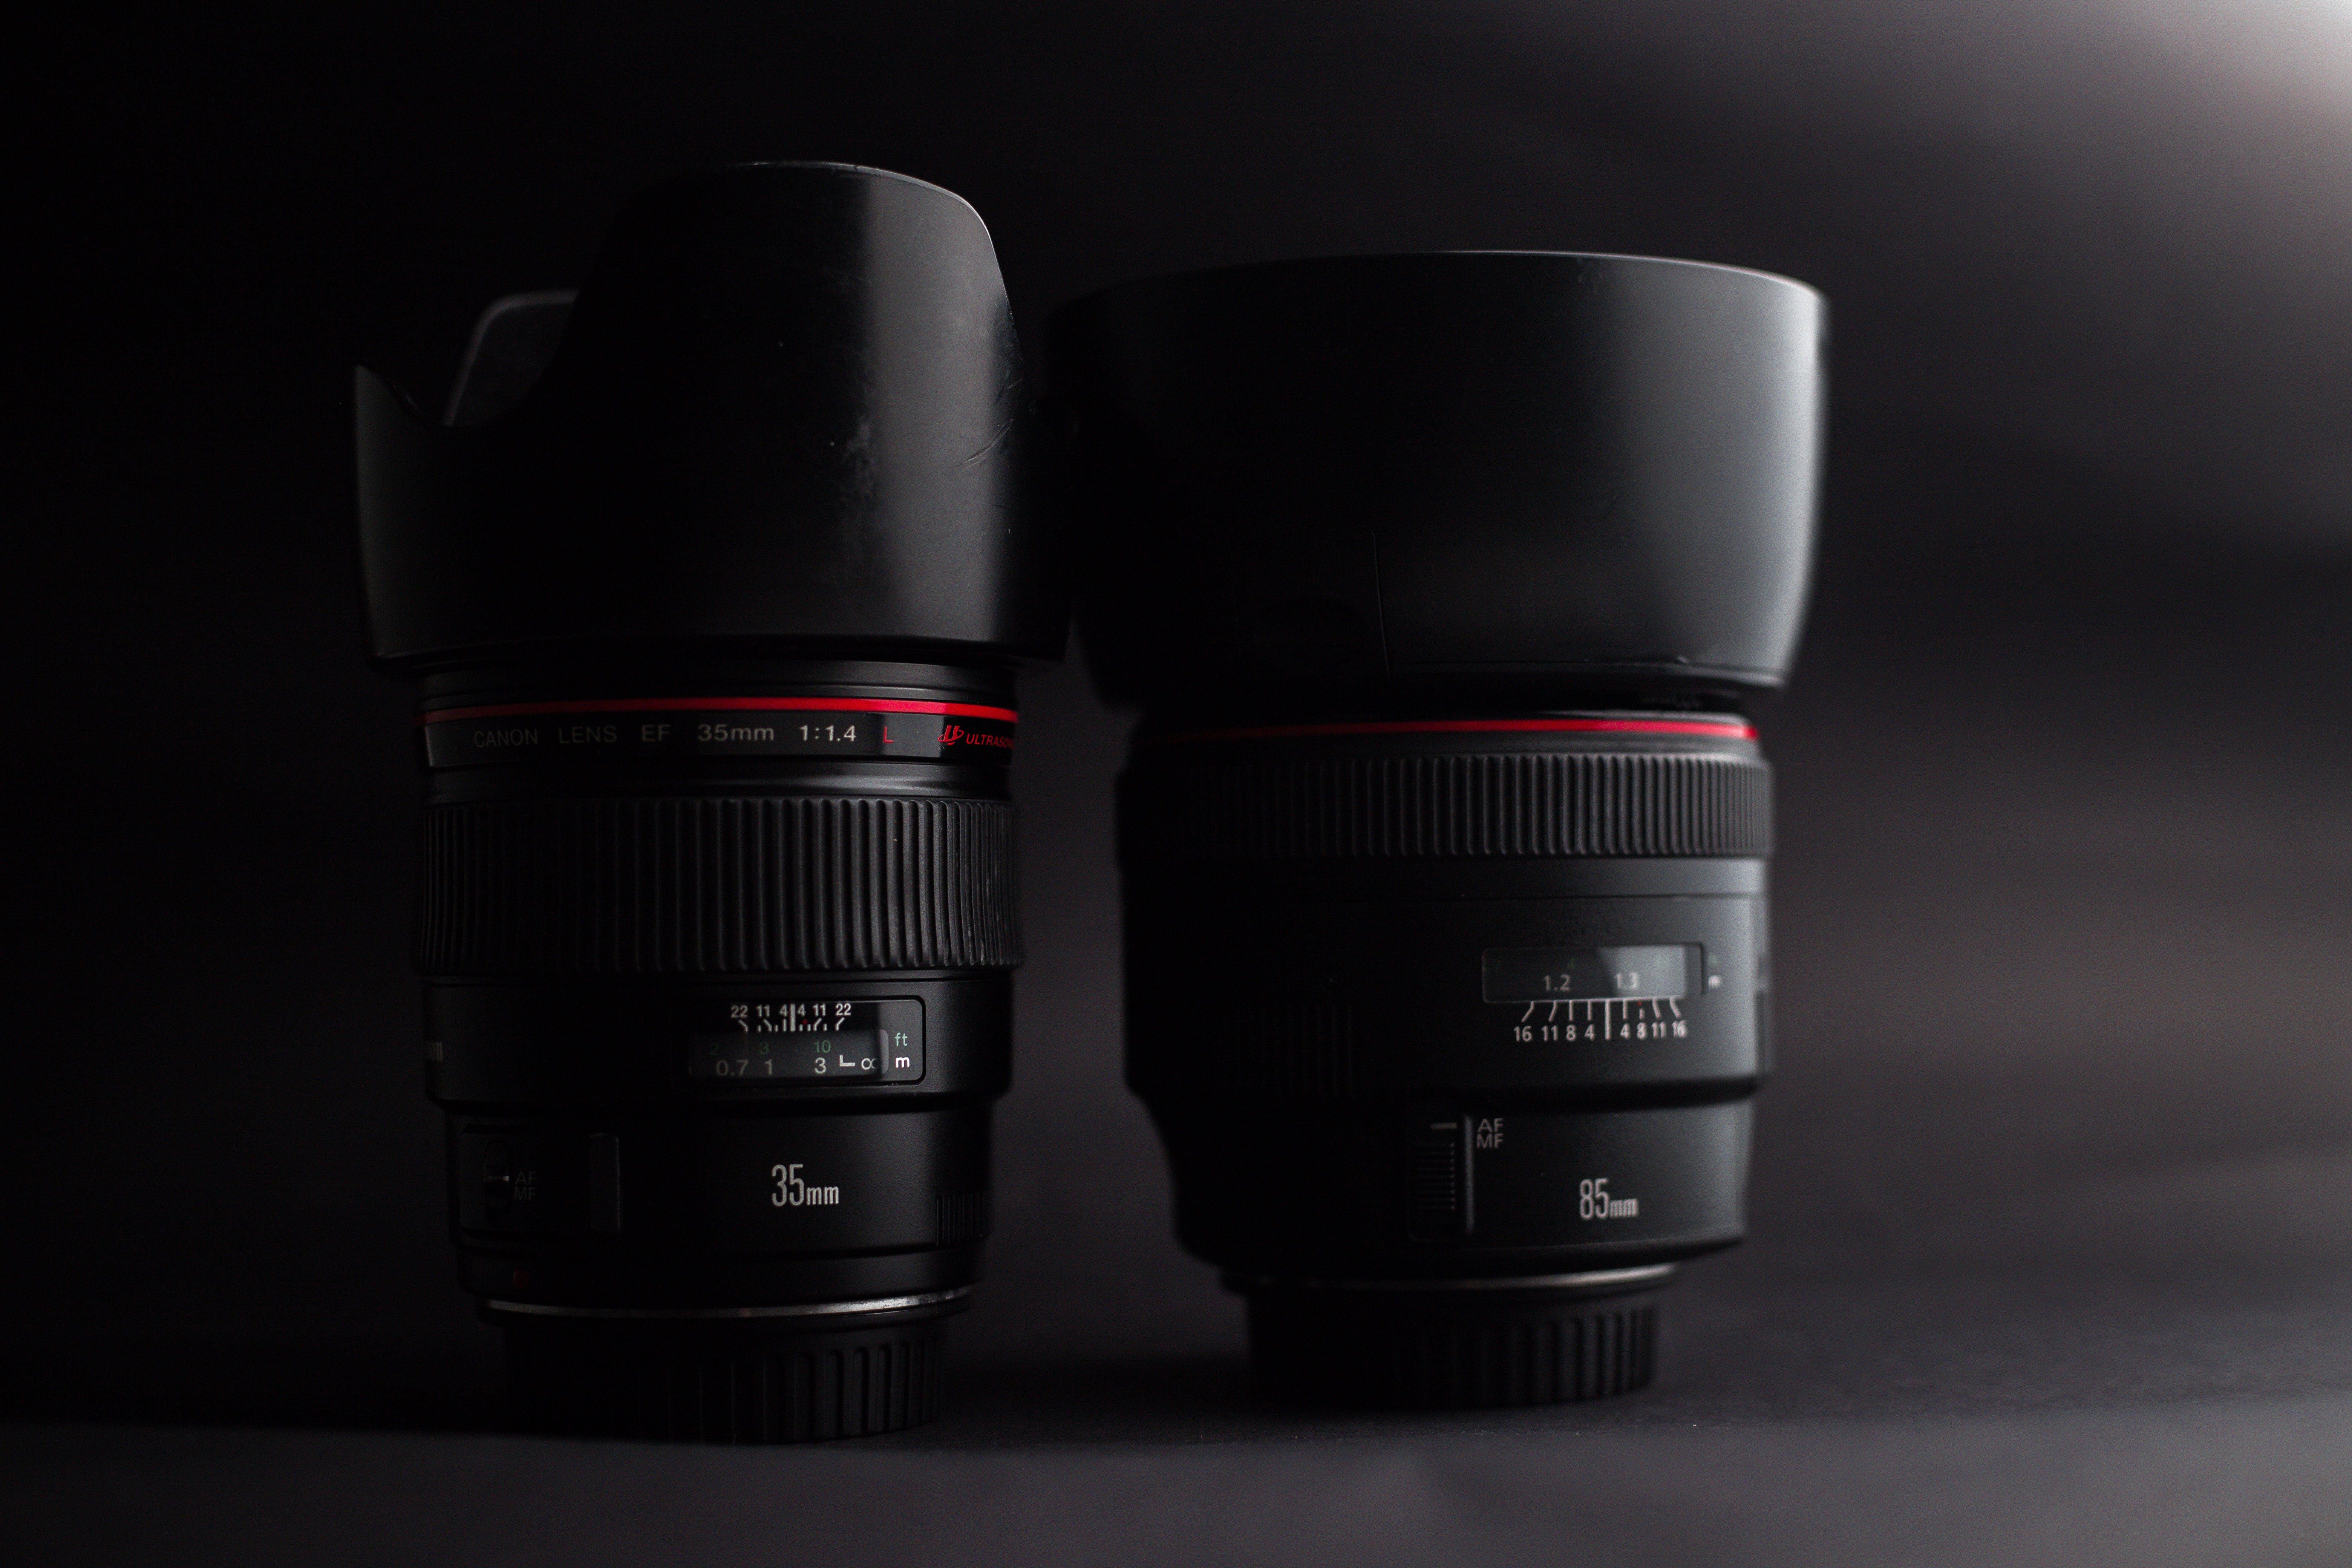 Fotos de stock gratuitas de 35 mm, 85mm, Canon, equipo